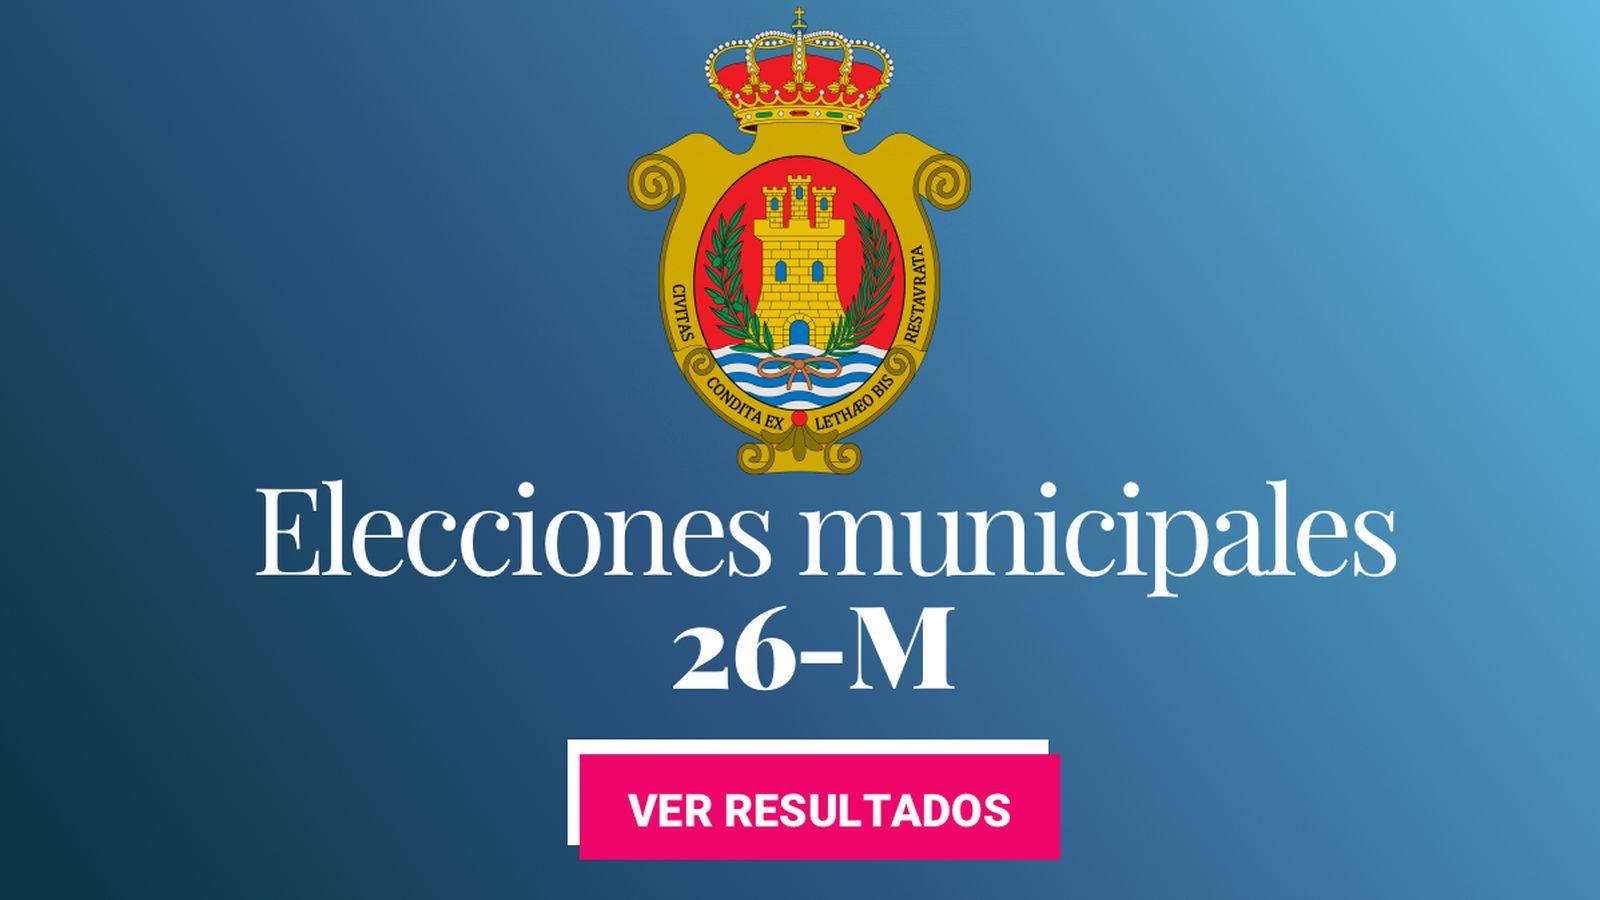 Foto: Elecciones municipales 2019 en Algeciras. (C.C./EC)